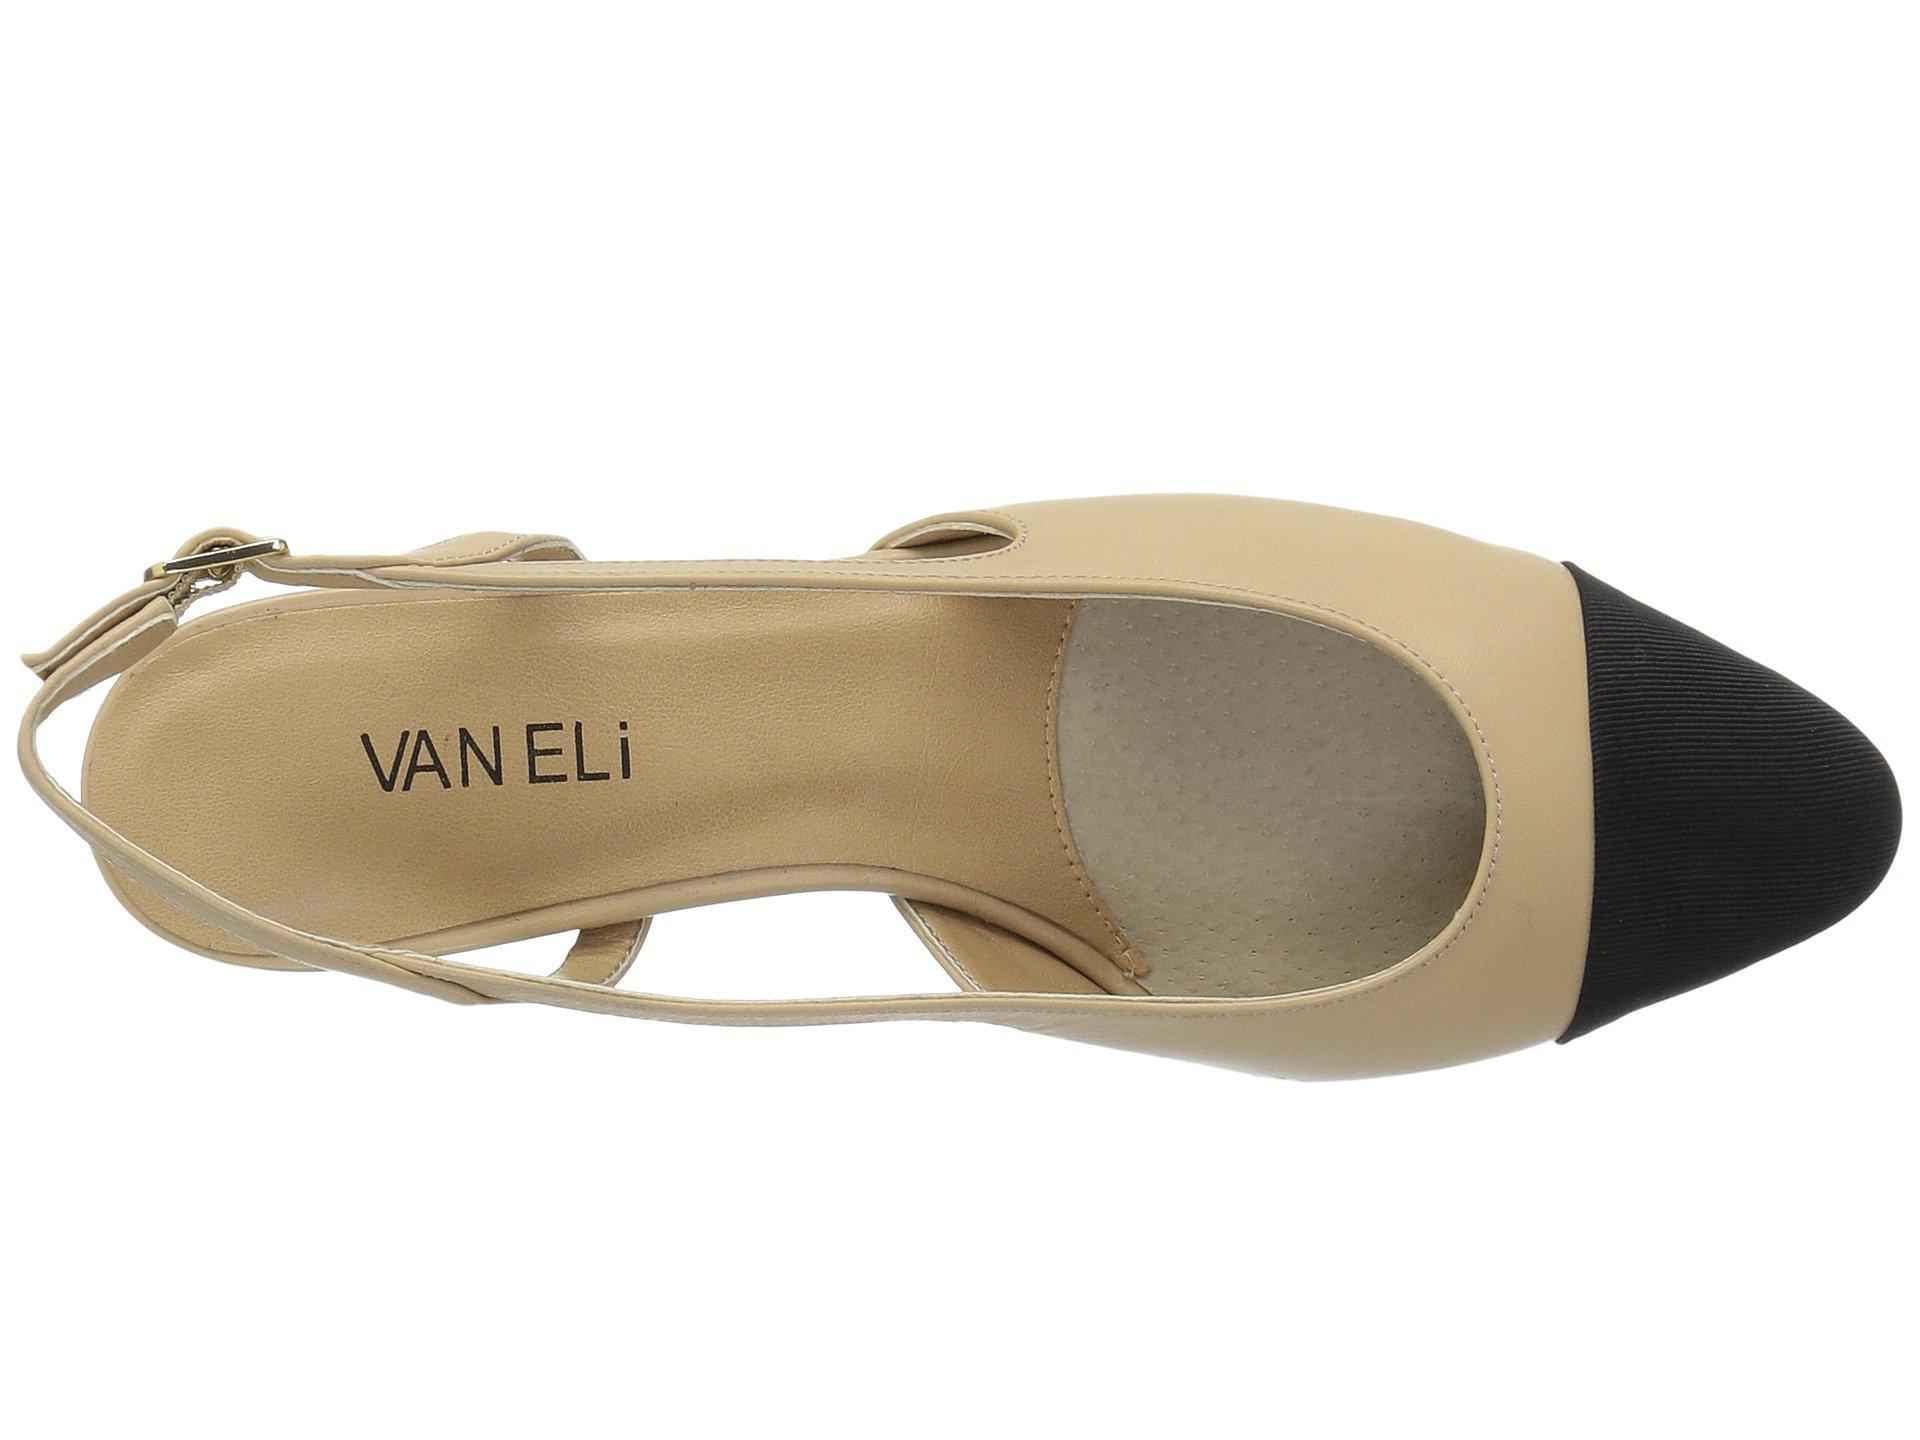 77993cb99b6 Lyst - Vaneli Aliz (platinum Nizza) Women s 1-2 Inch Heel Shoes in Black